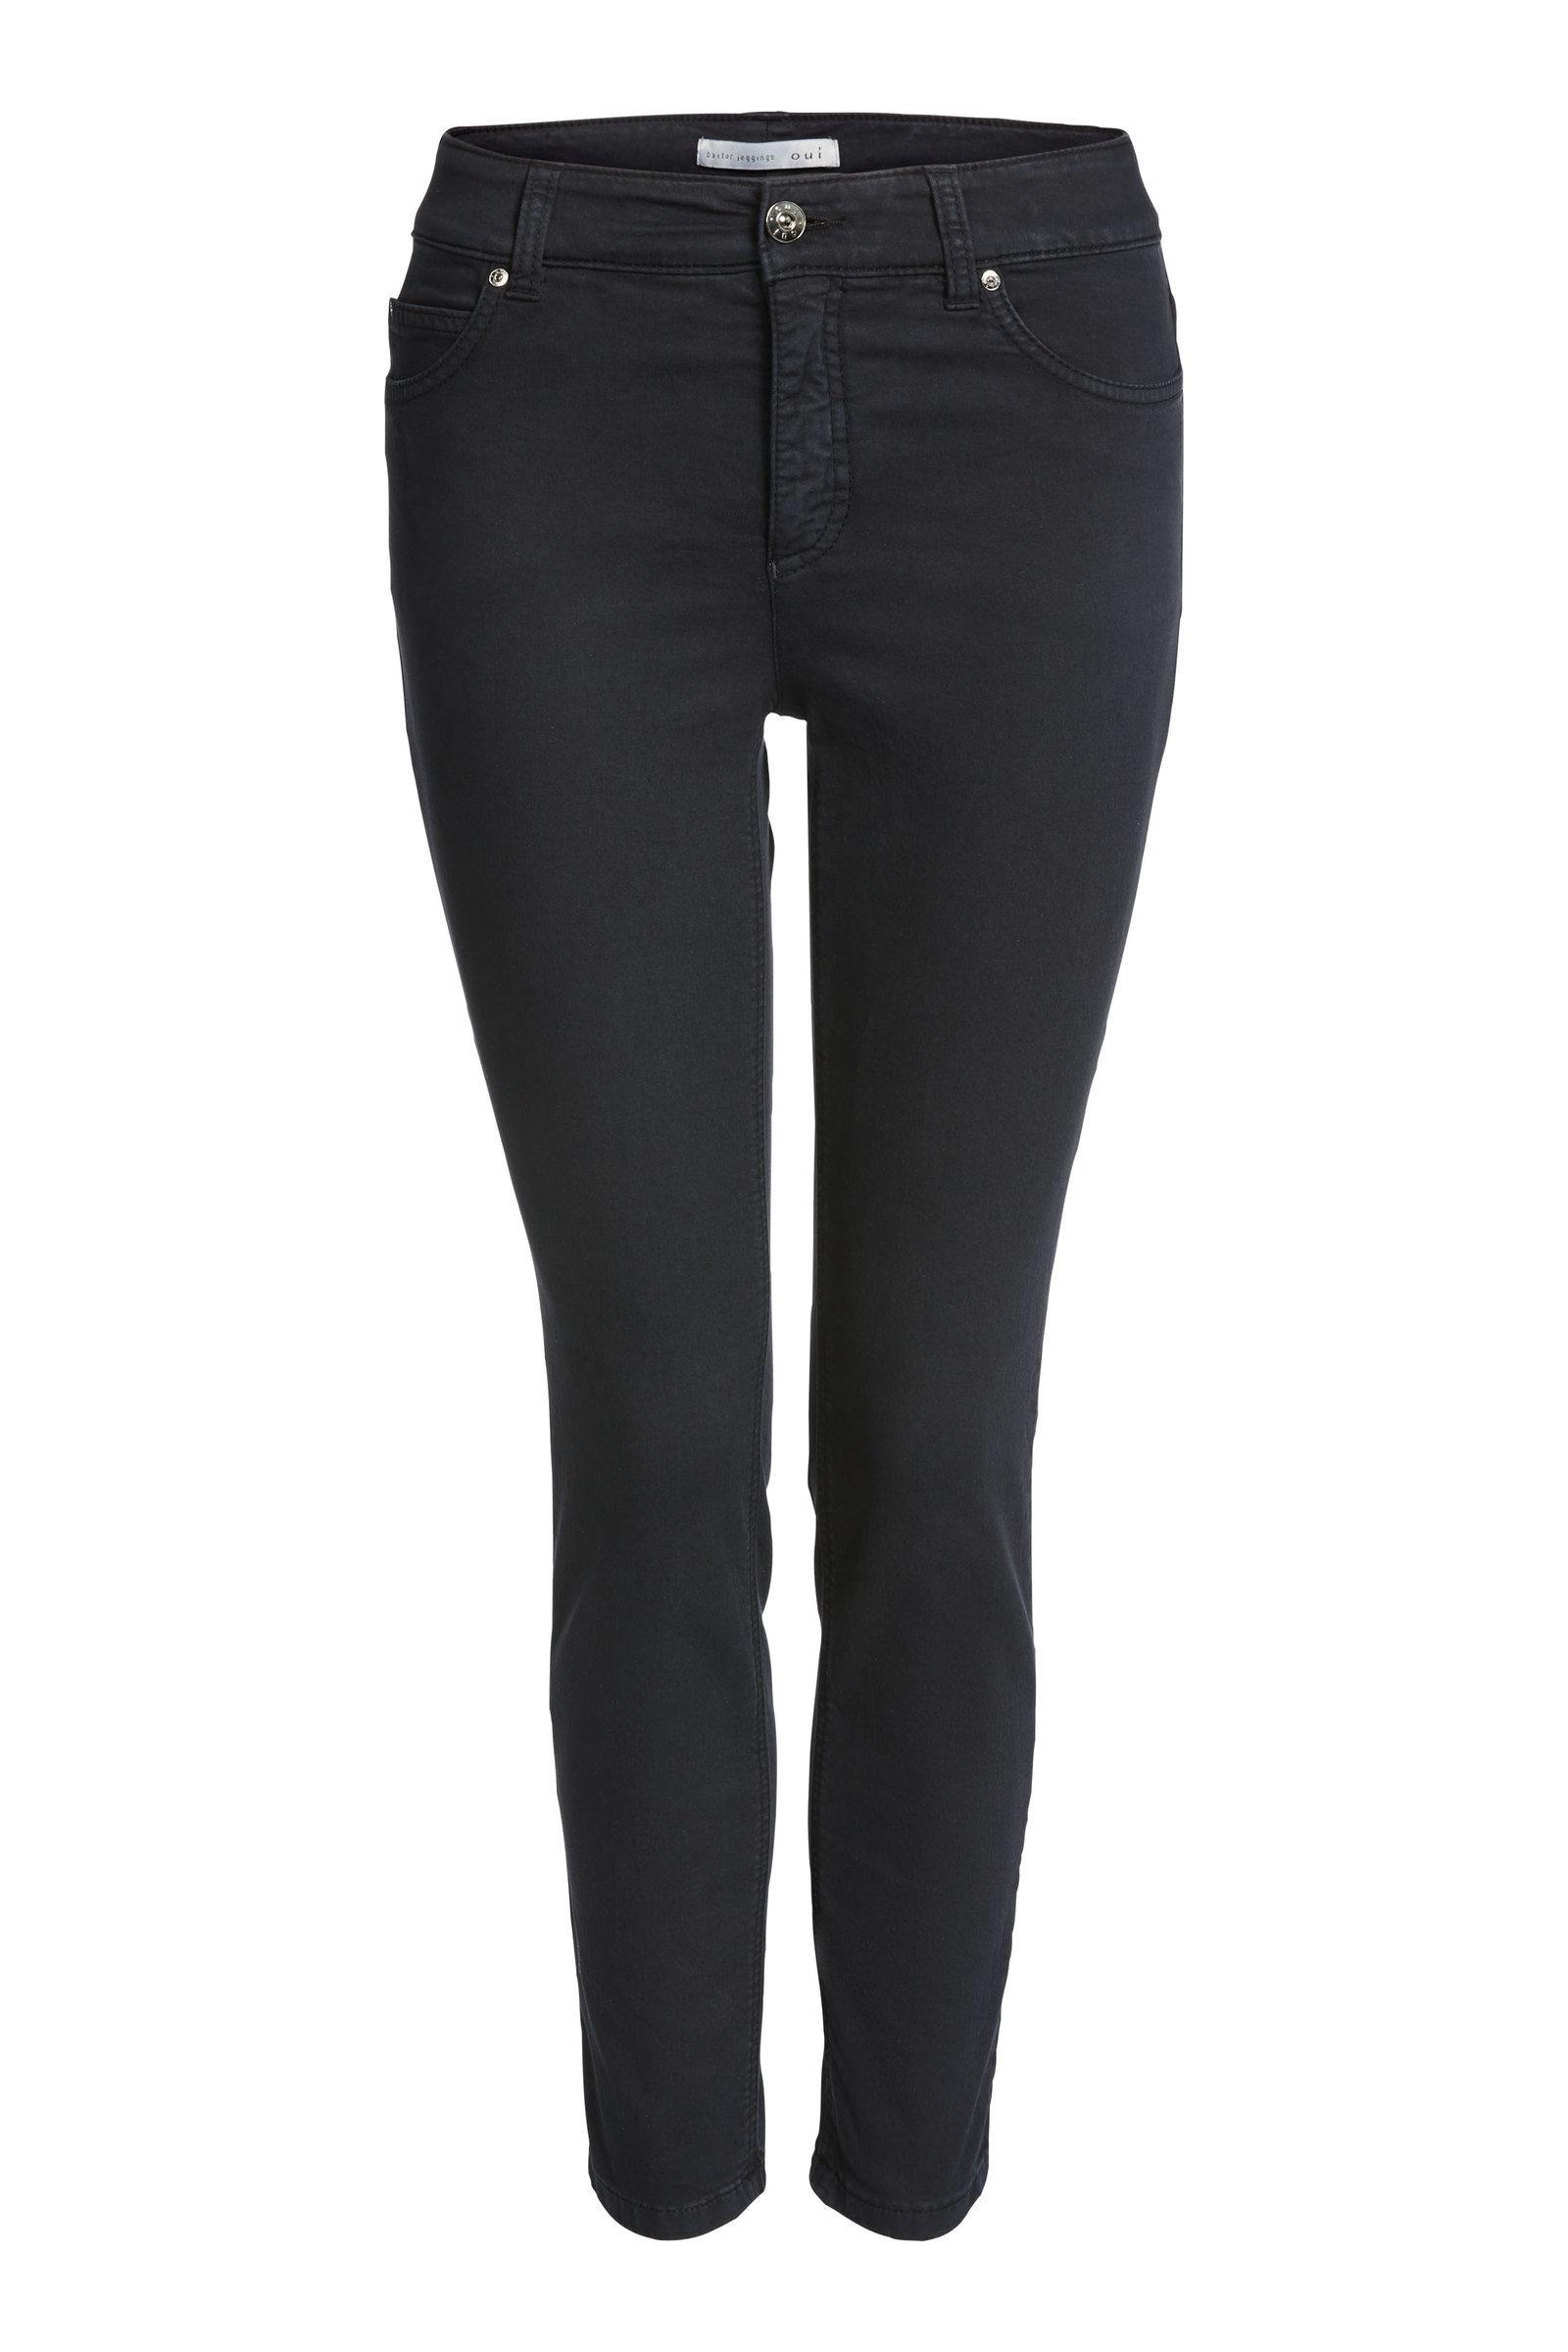 Slim Fit Jeans Black OUTR51644BLACK